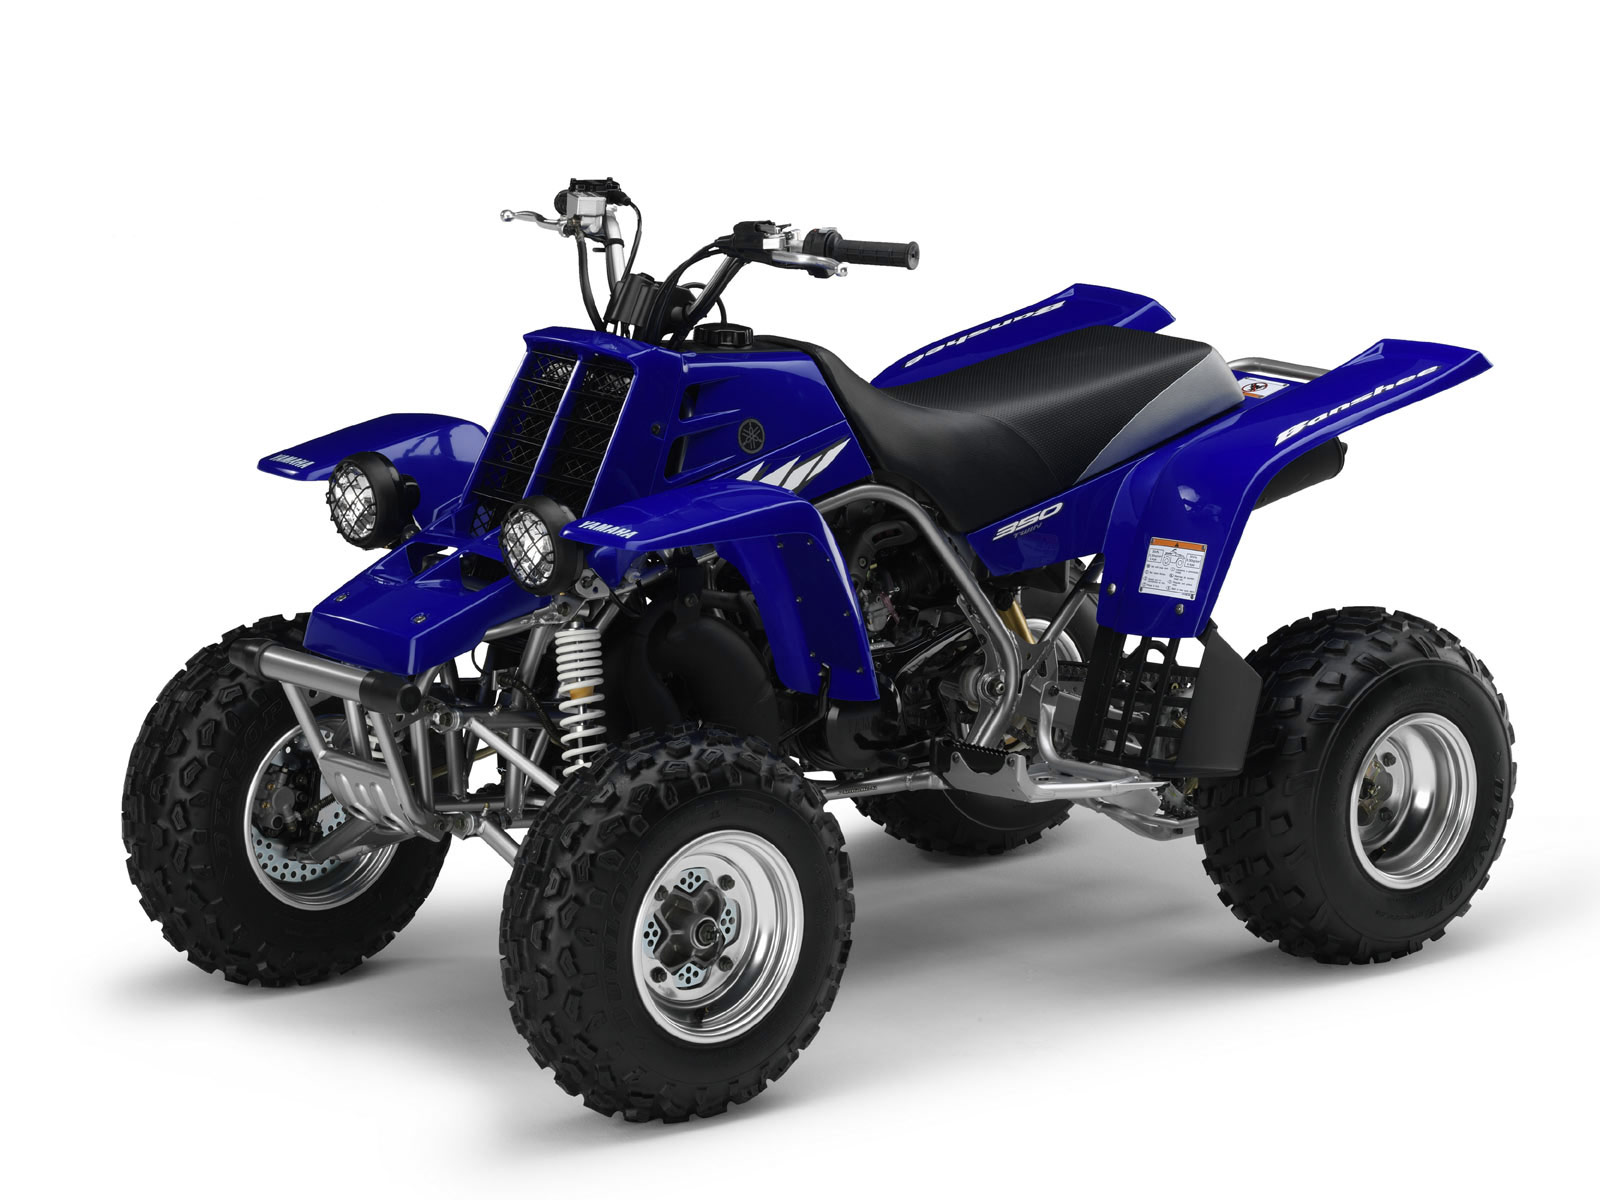 Yamaha_Banshee_350_2006_ATV-12 2012 Yamaha Banshee